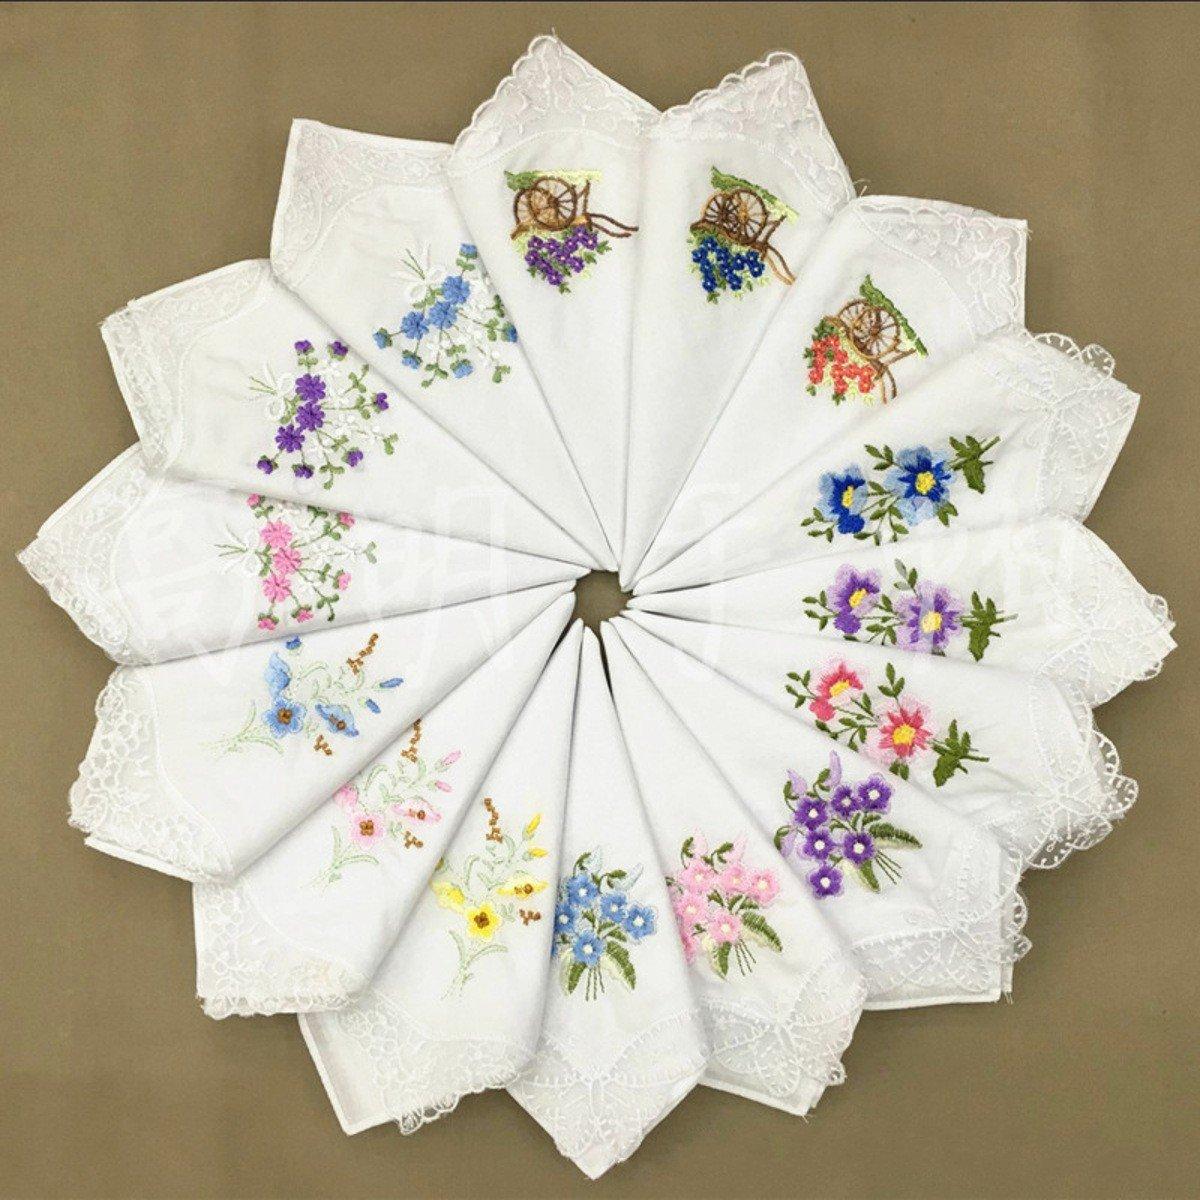 6pcs Women Butterfly Flower Embroidery Cotton Lace Handkerchiefs Floral Assorted